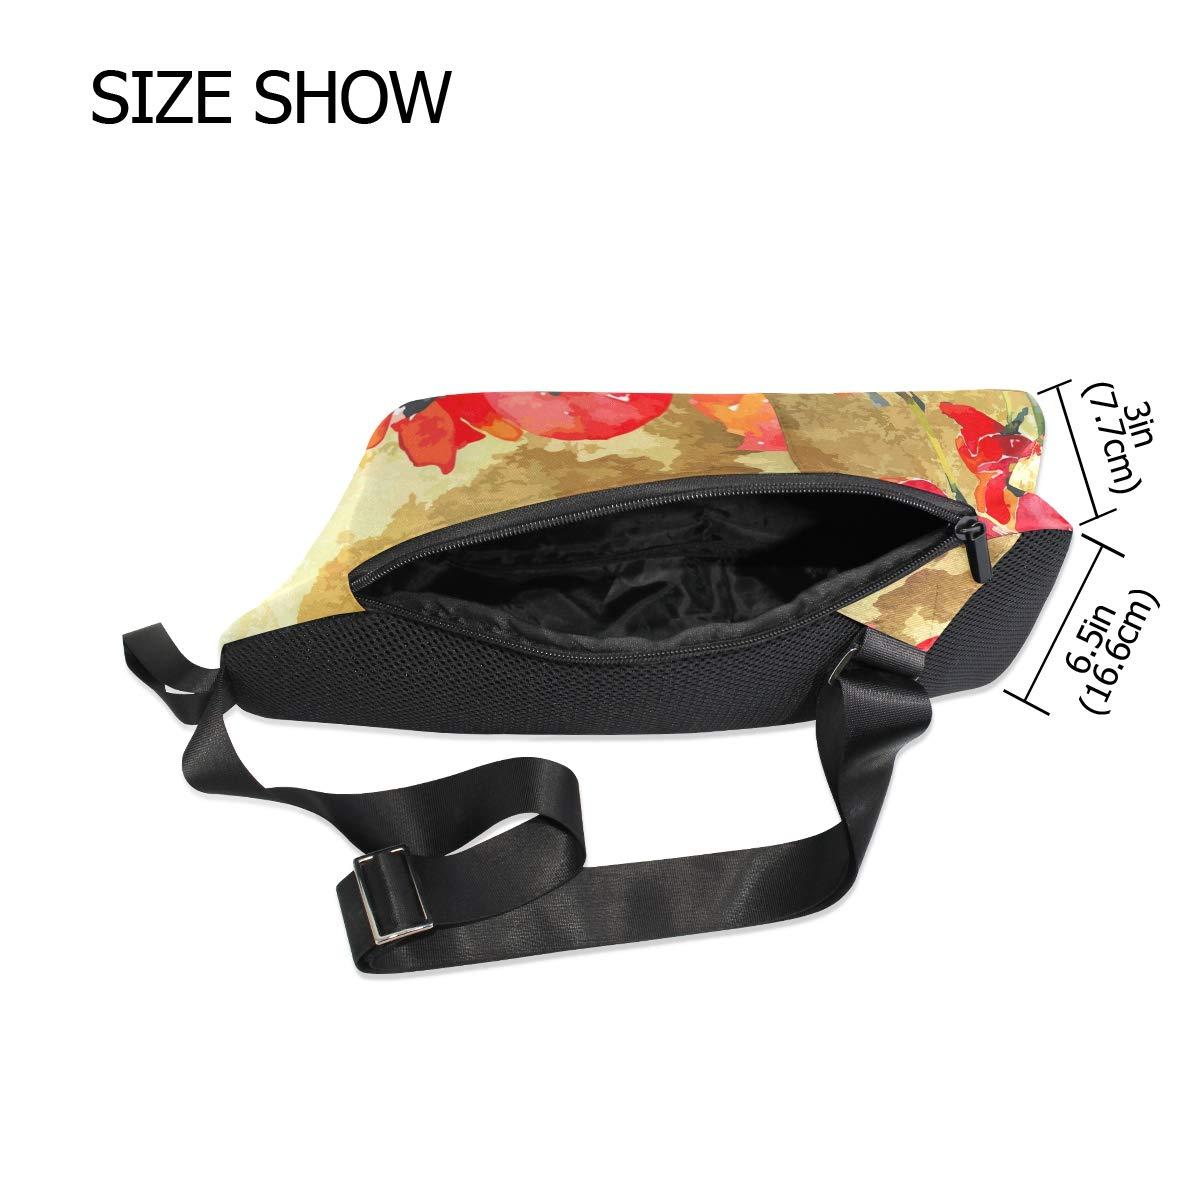 AHOMY Vintage Watercoulor Poppy Messenger Bag Small Travel School Sling Bag Crossbody Bag